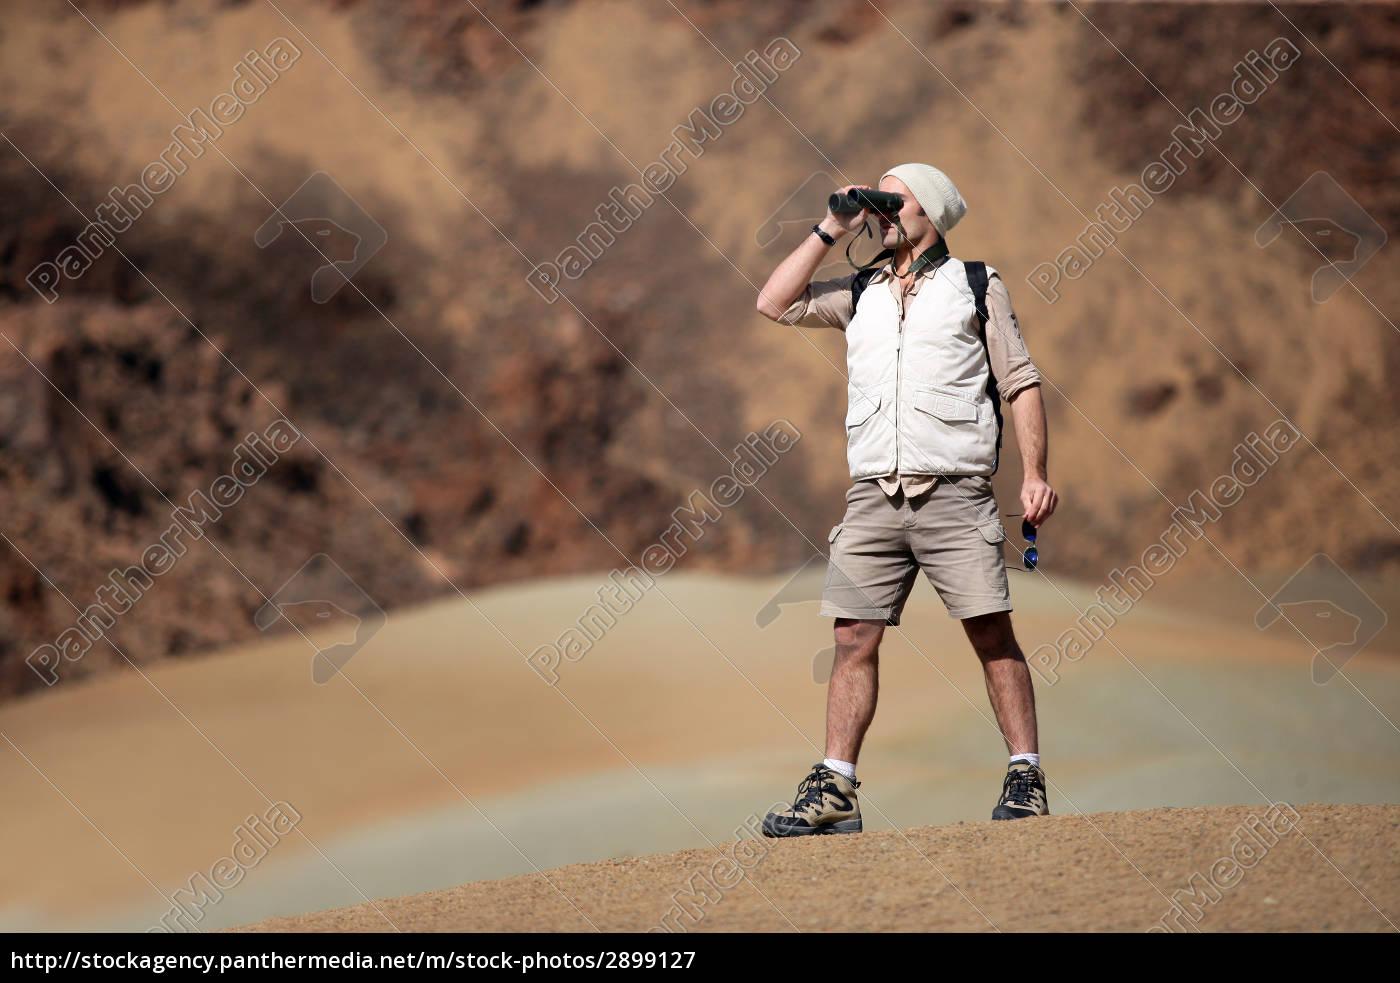 looking, man, walking, away, with, binoculars - 2899127